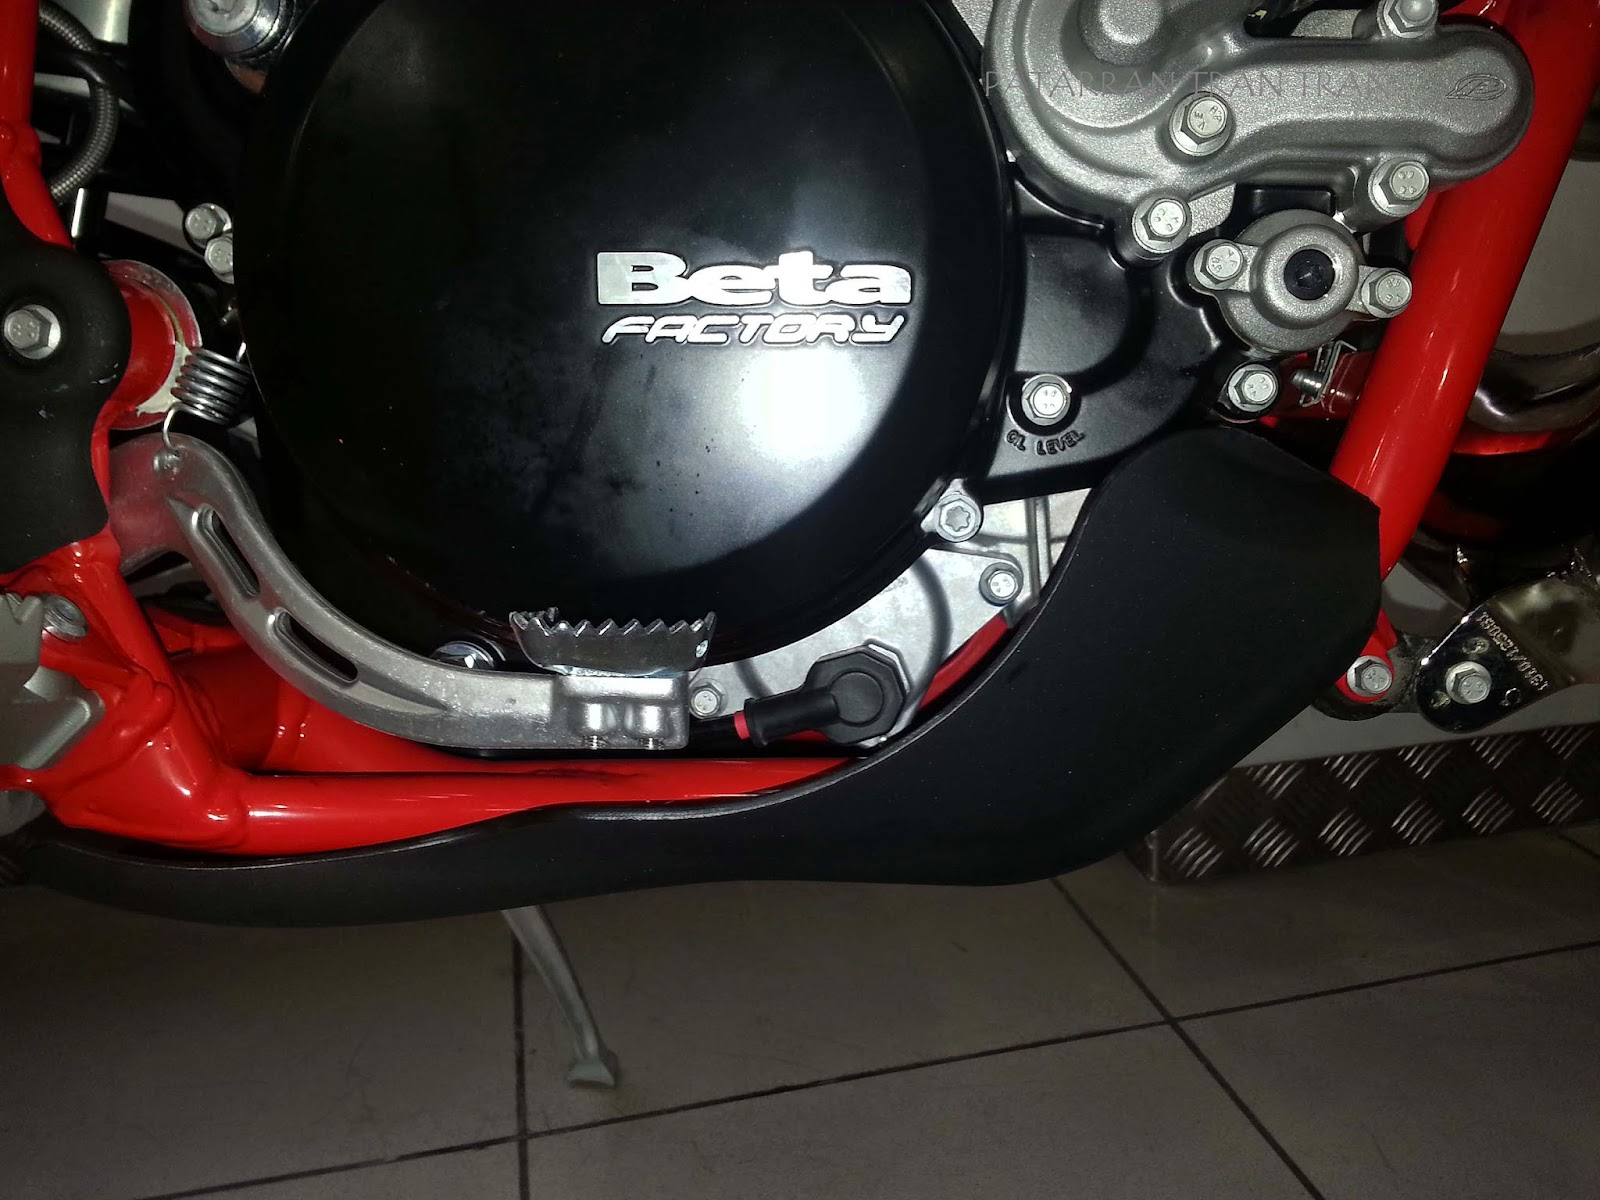 Beta 300rr 2104